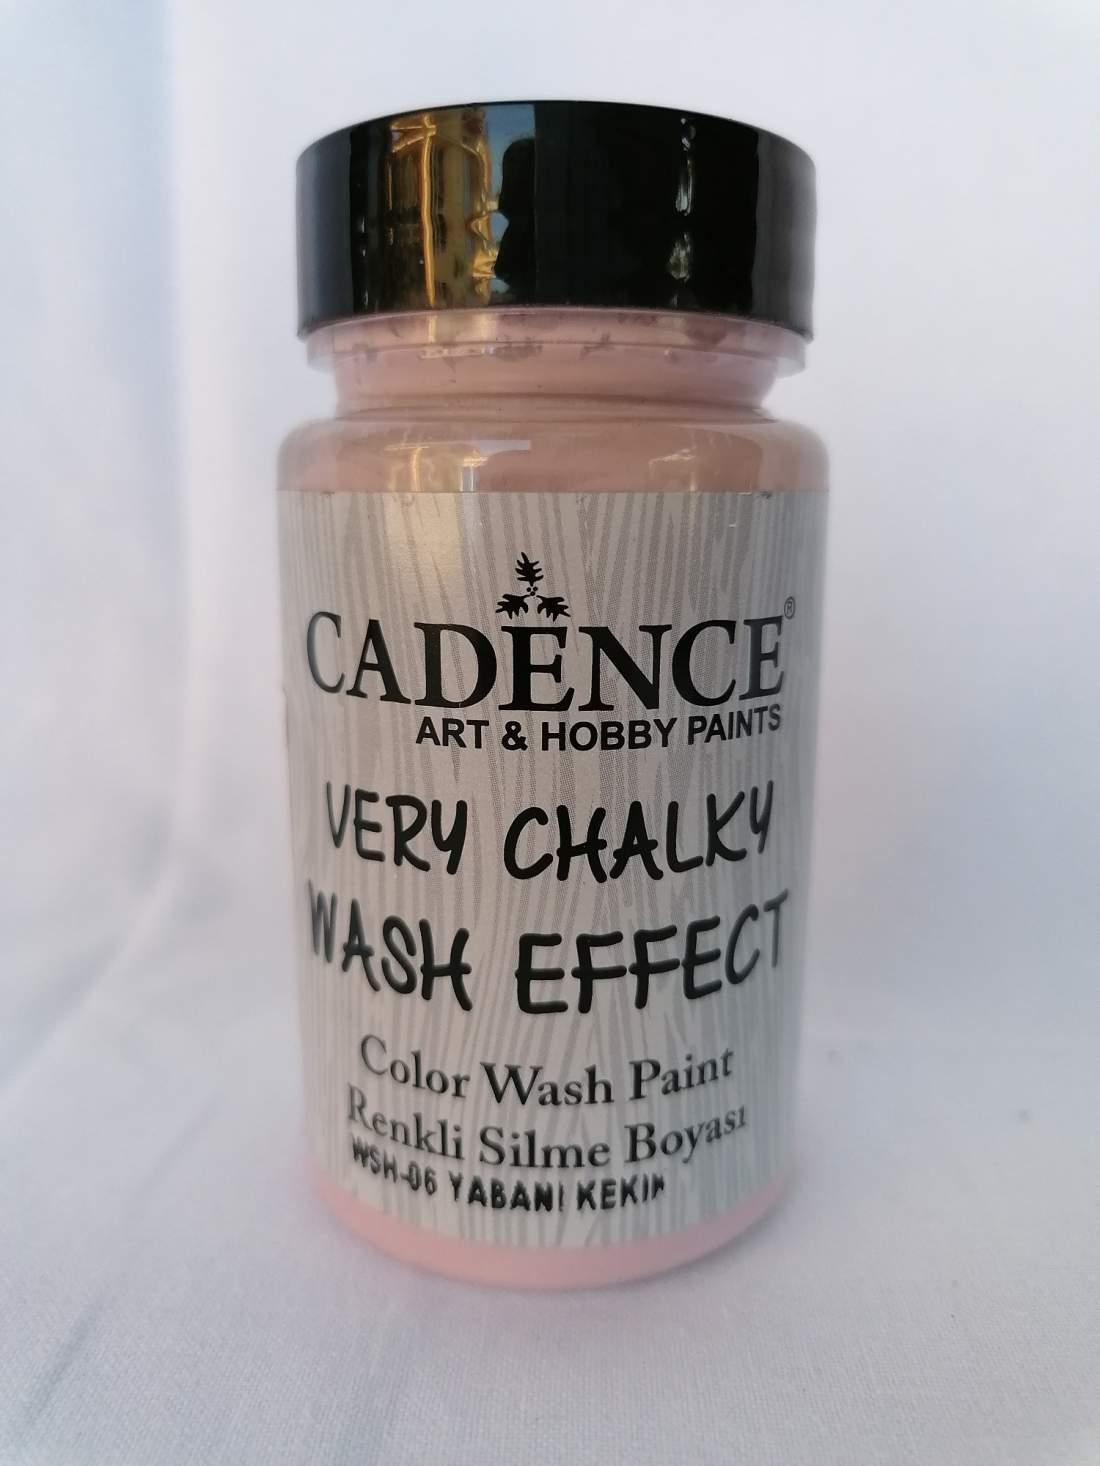 Very Chalky Wash Effekt - kakukkfű